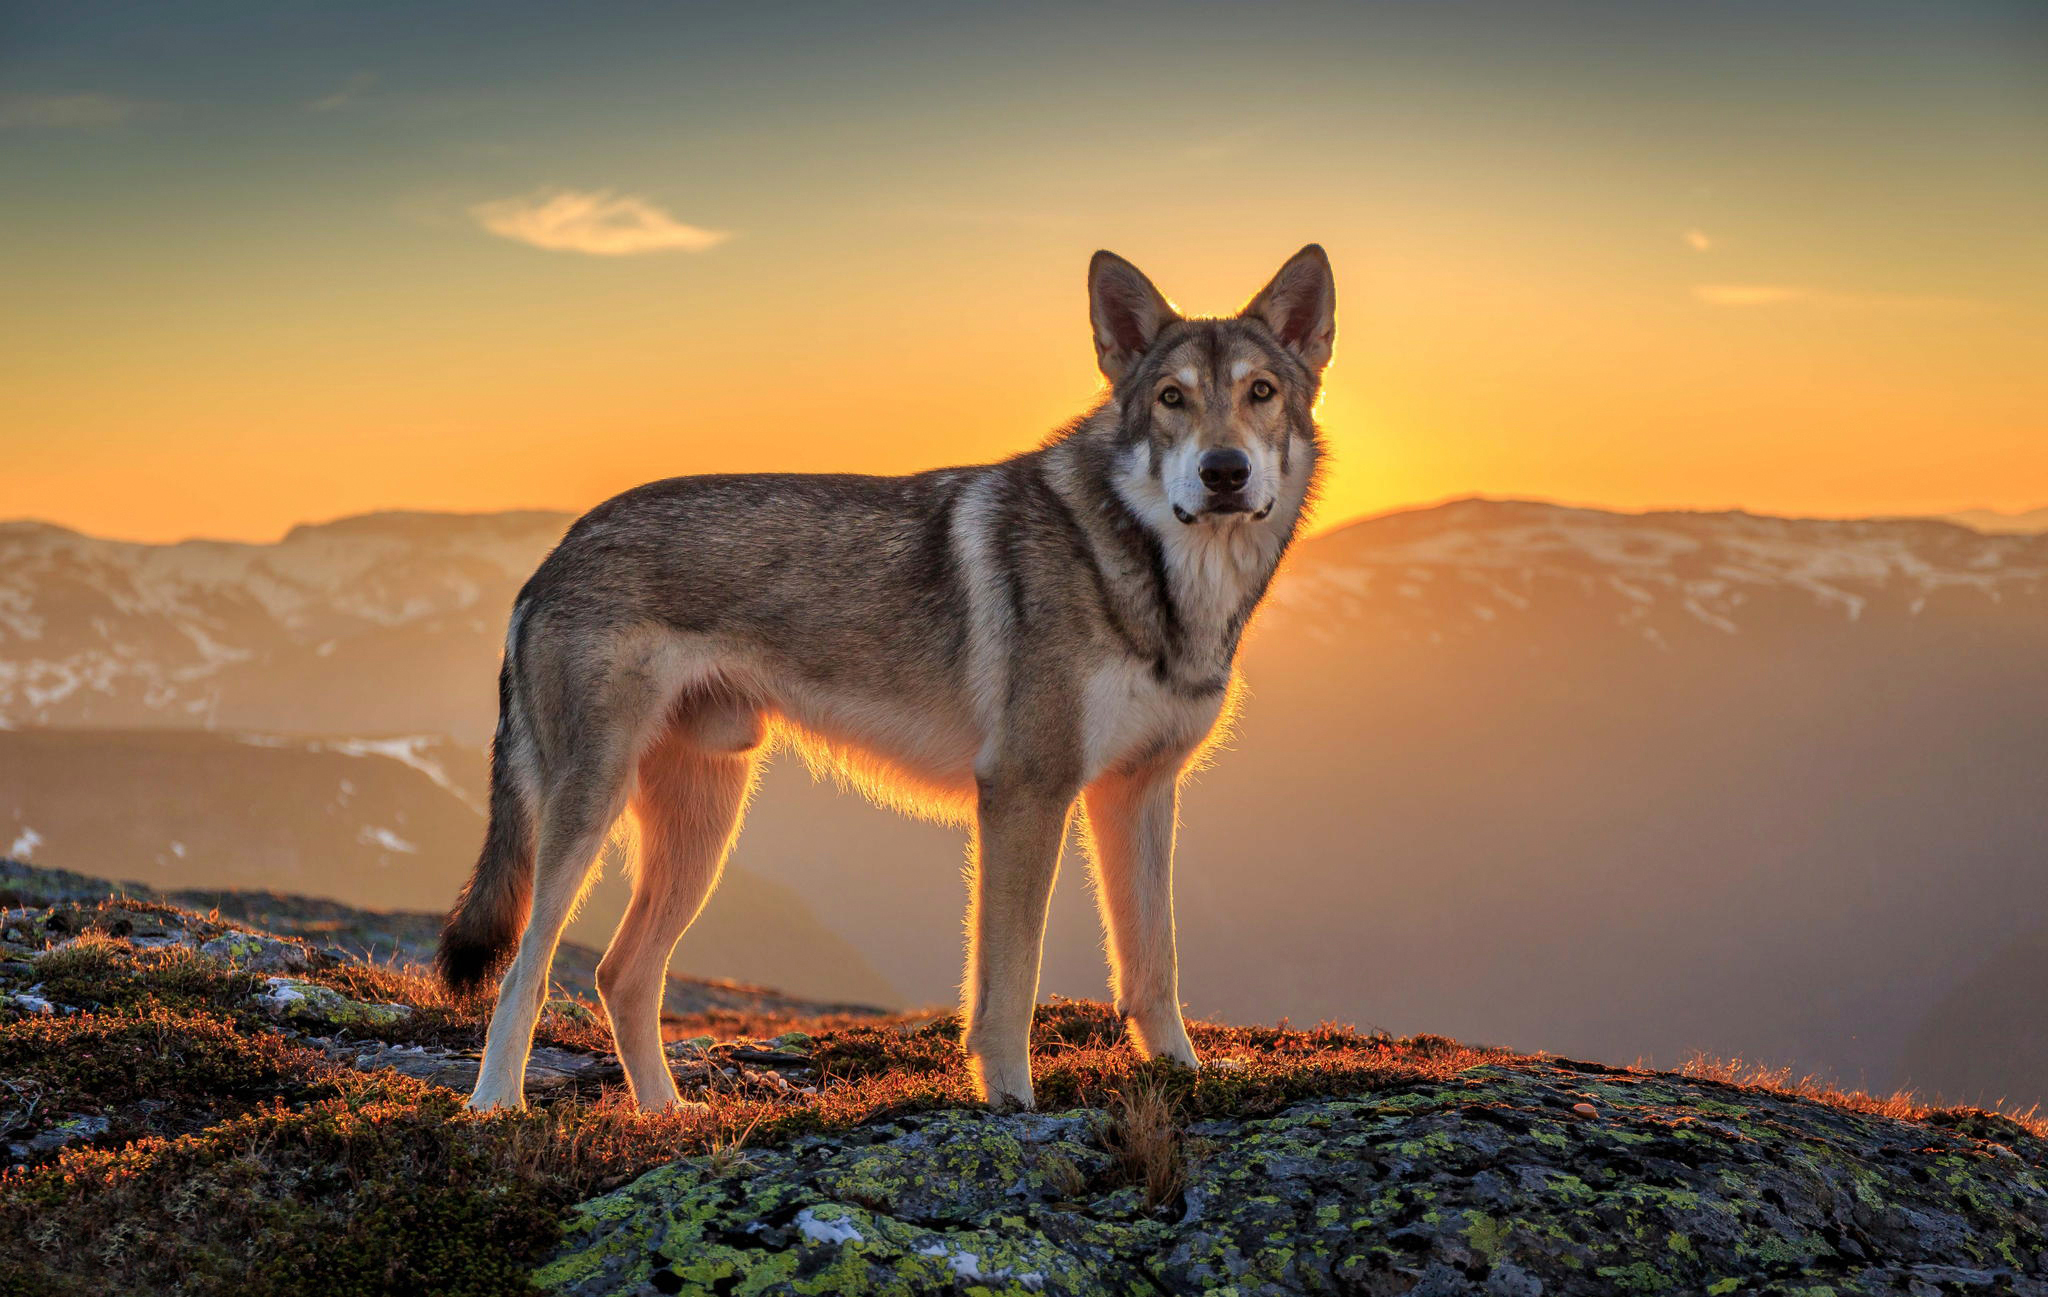 Собака на фоне заката  № 2038640 загрузить